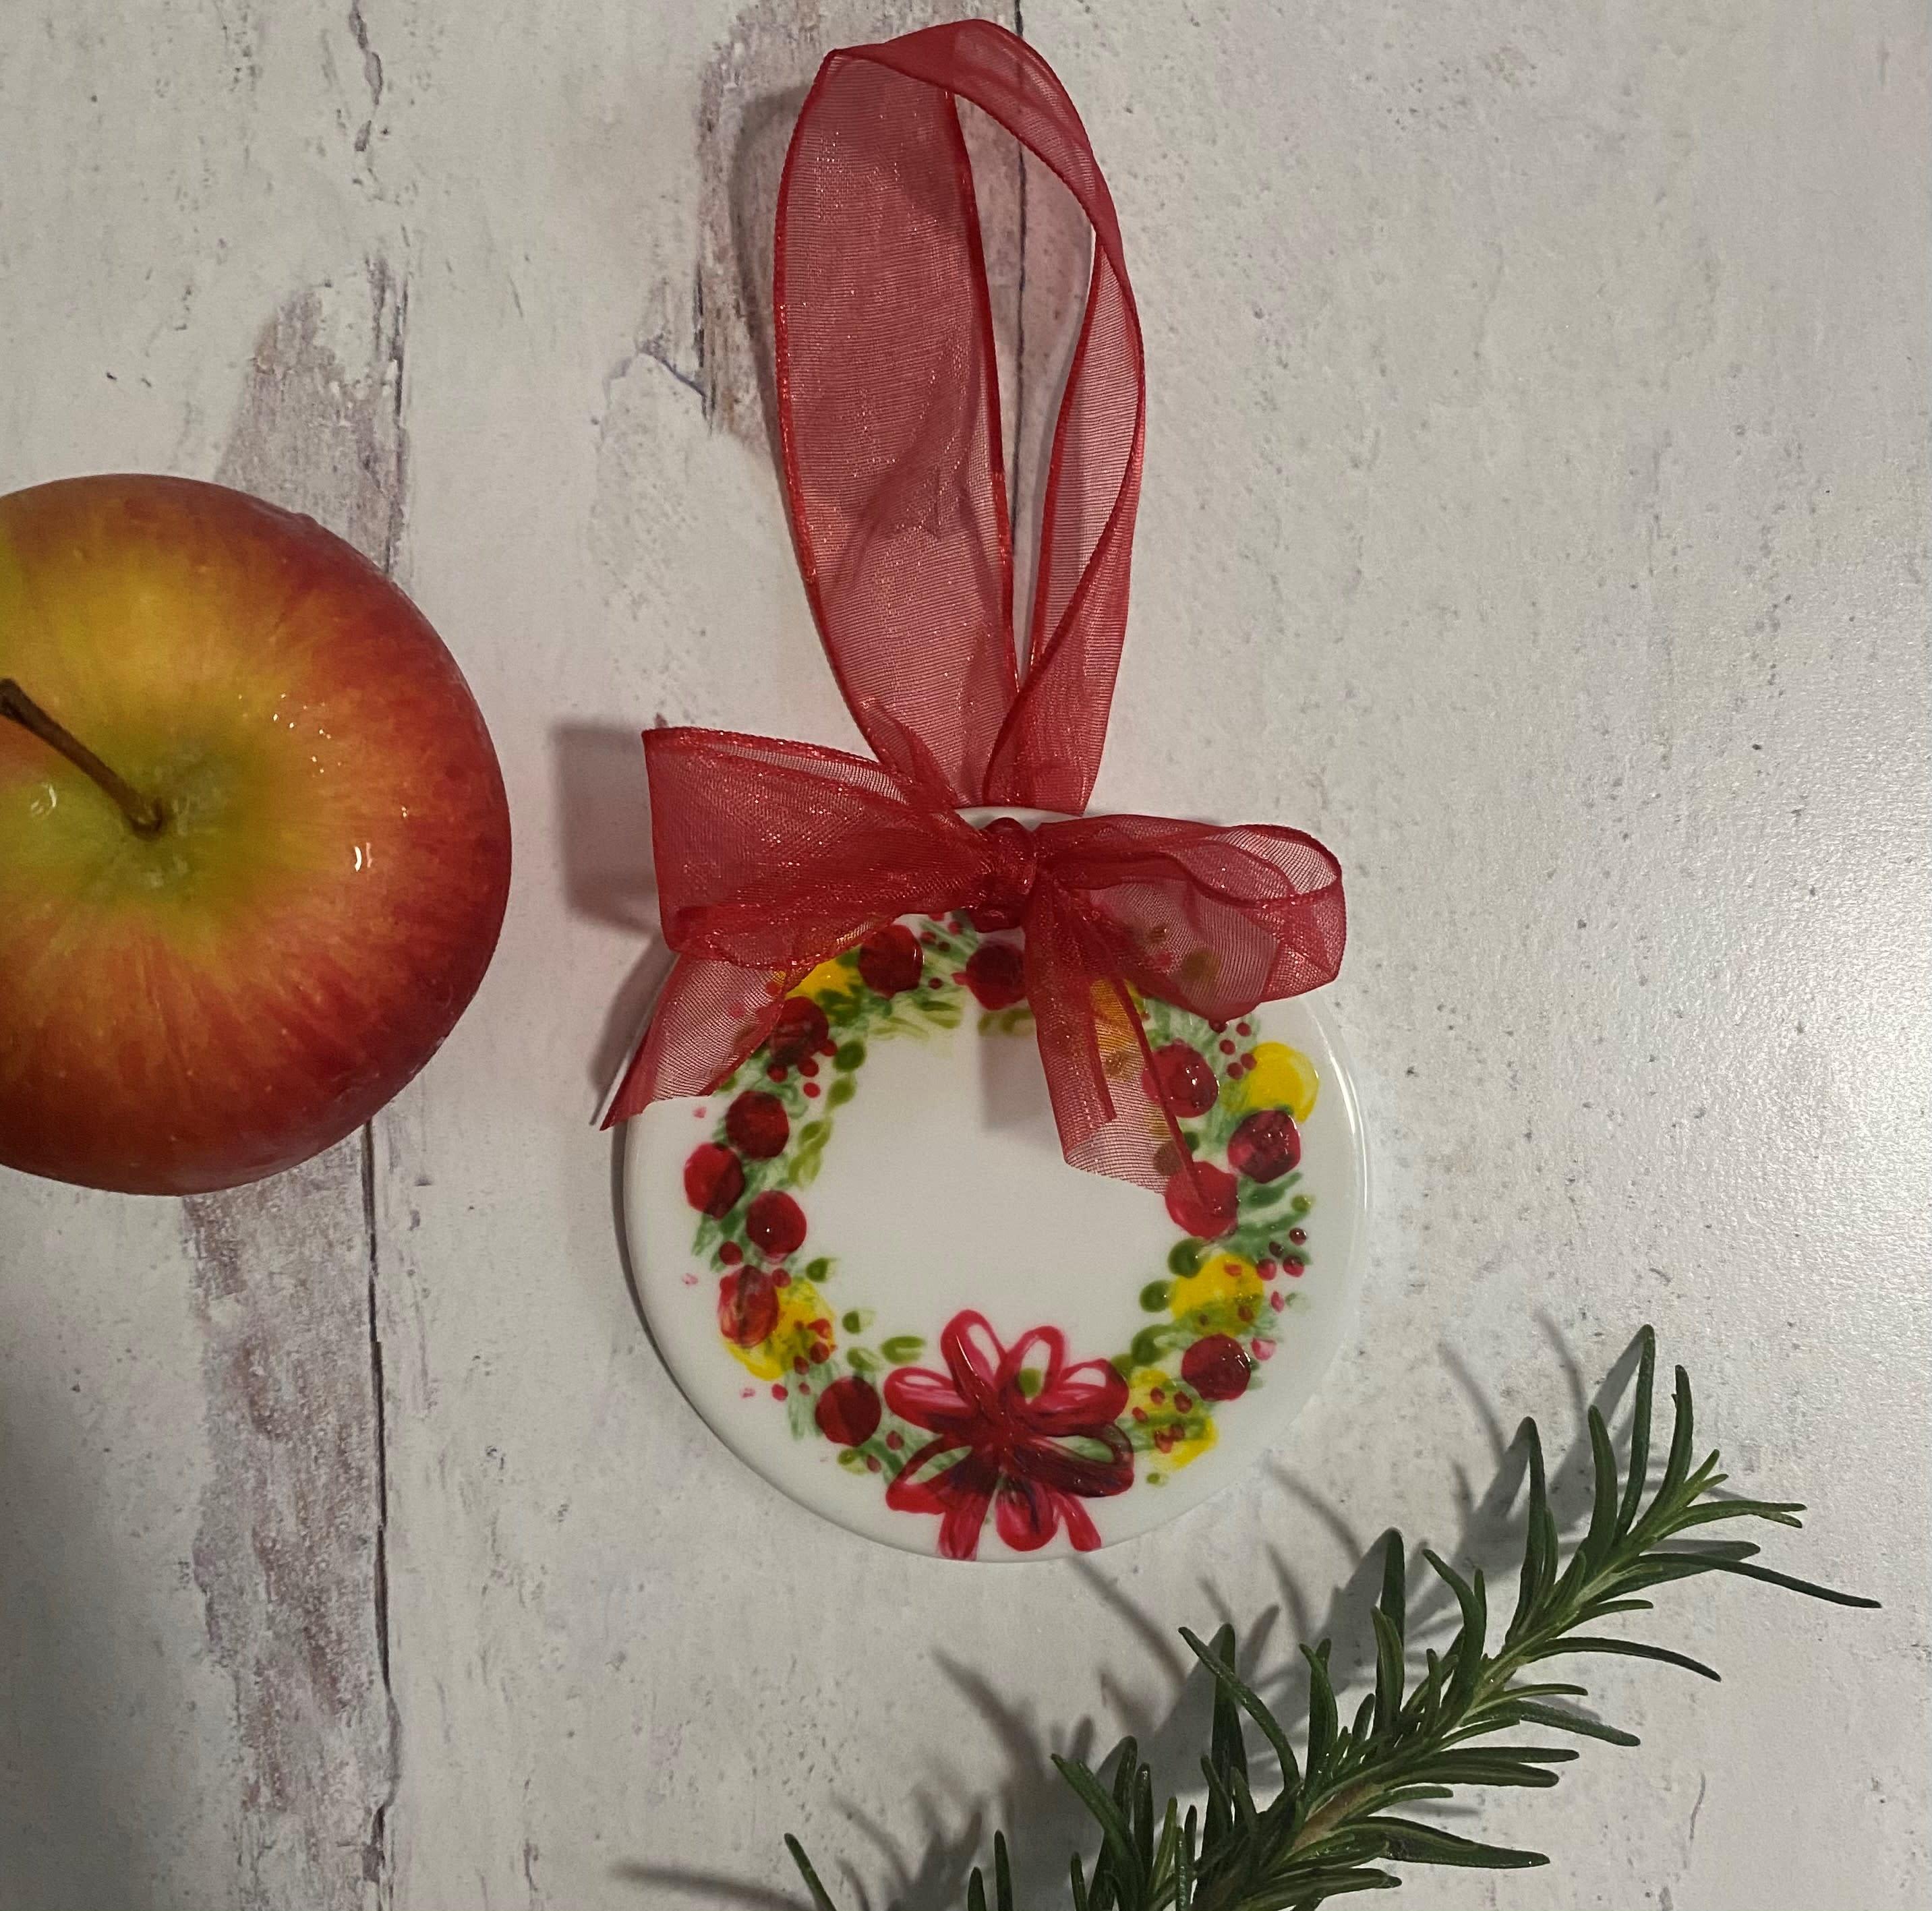 Ornament wreath group 1 1 lg6oqv